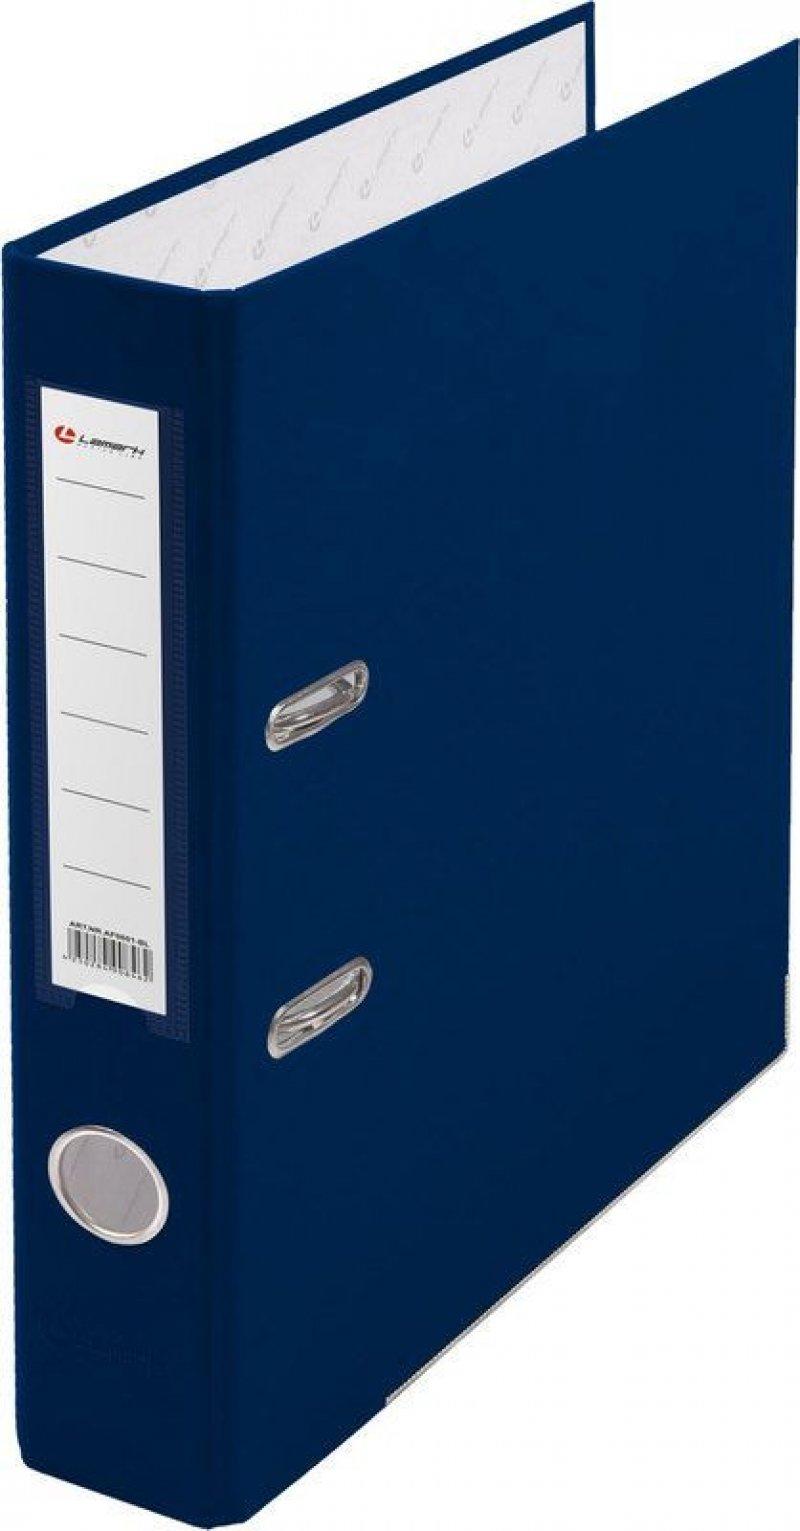 Папка-регистратор 50мм Lamark бумвинил карман синий металл